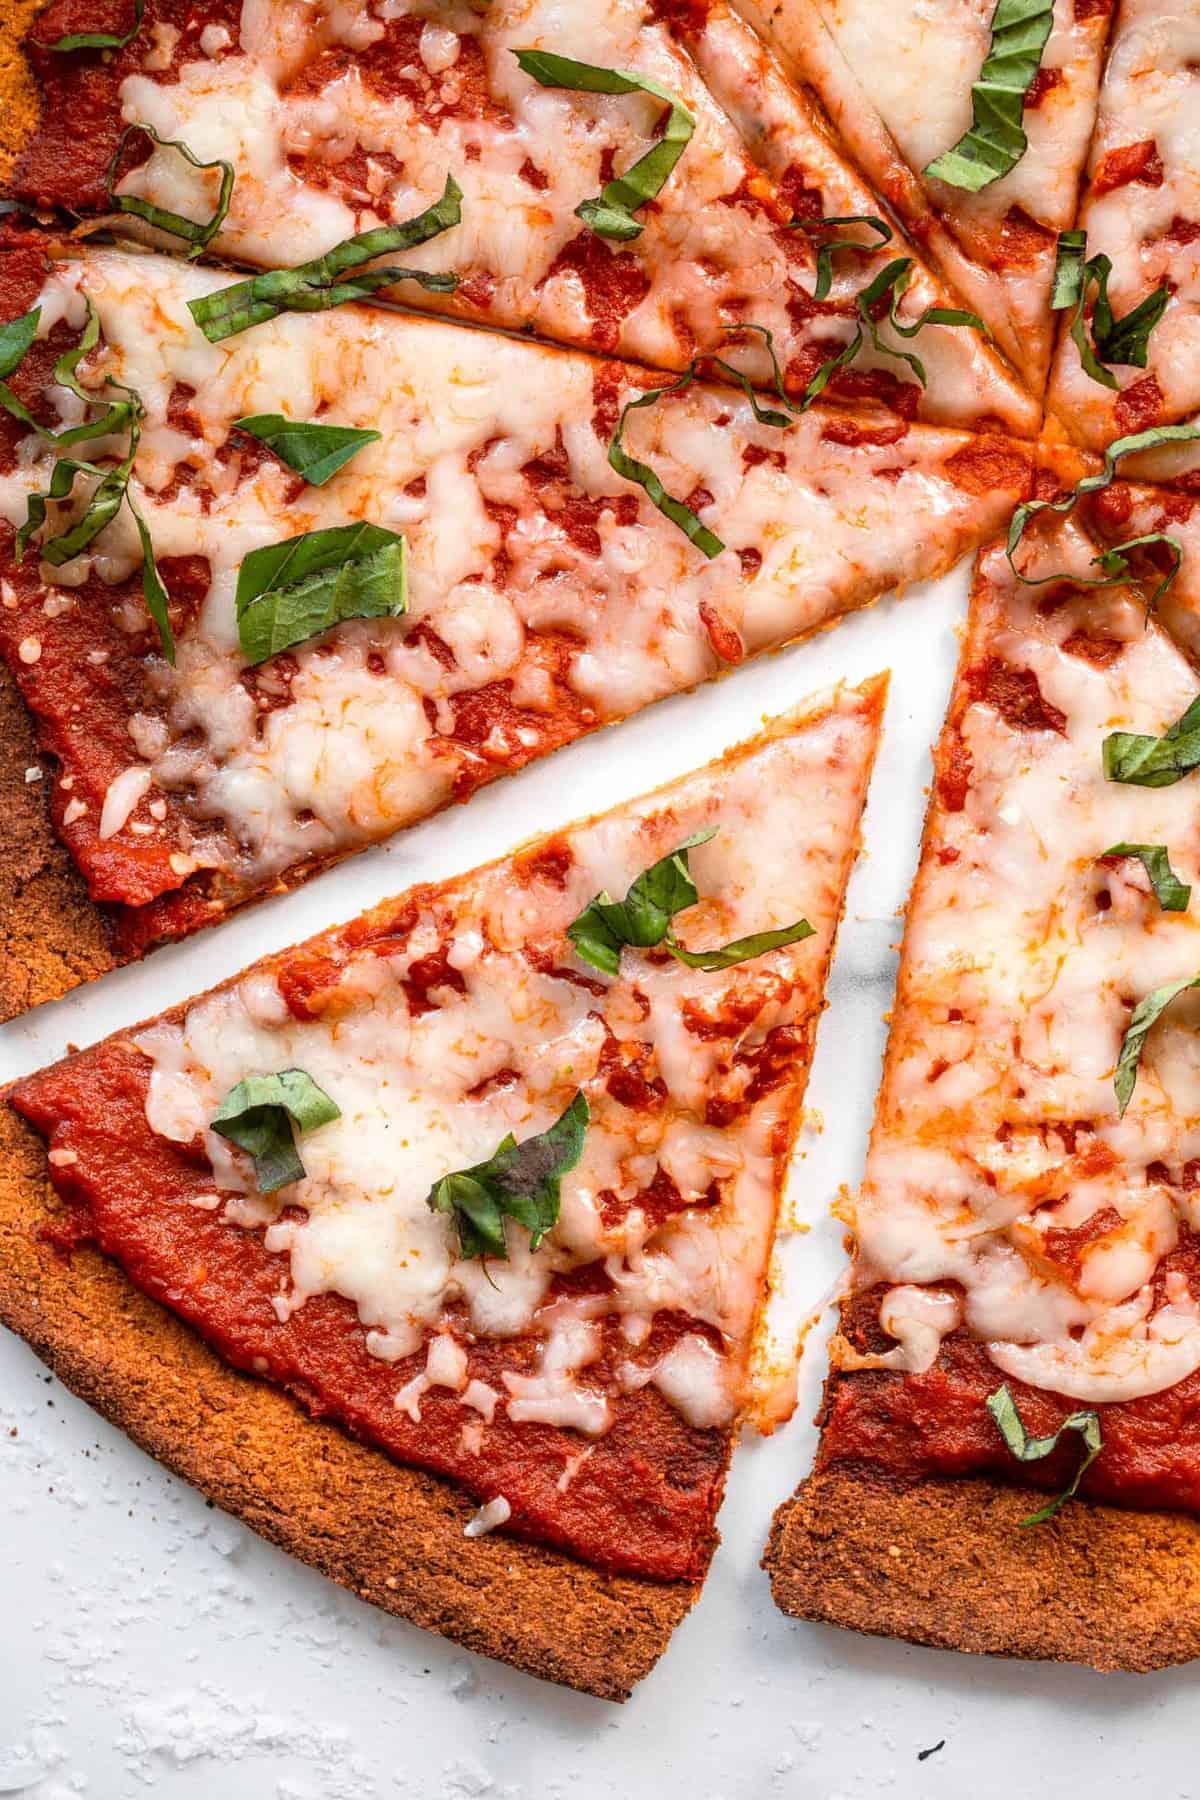 Sweet Potato pizza Crust close up cut into pieces